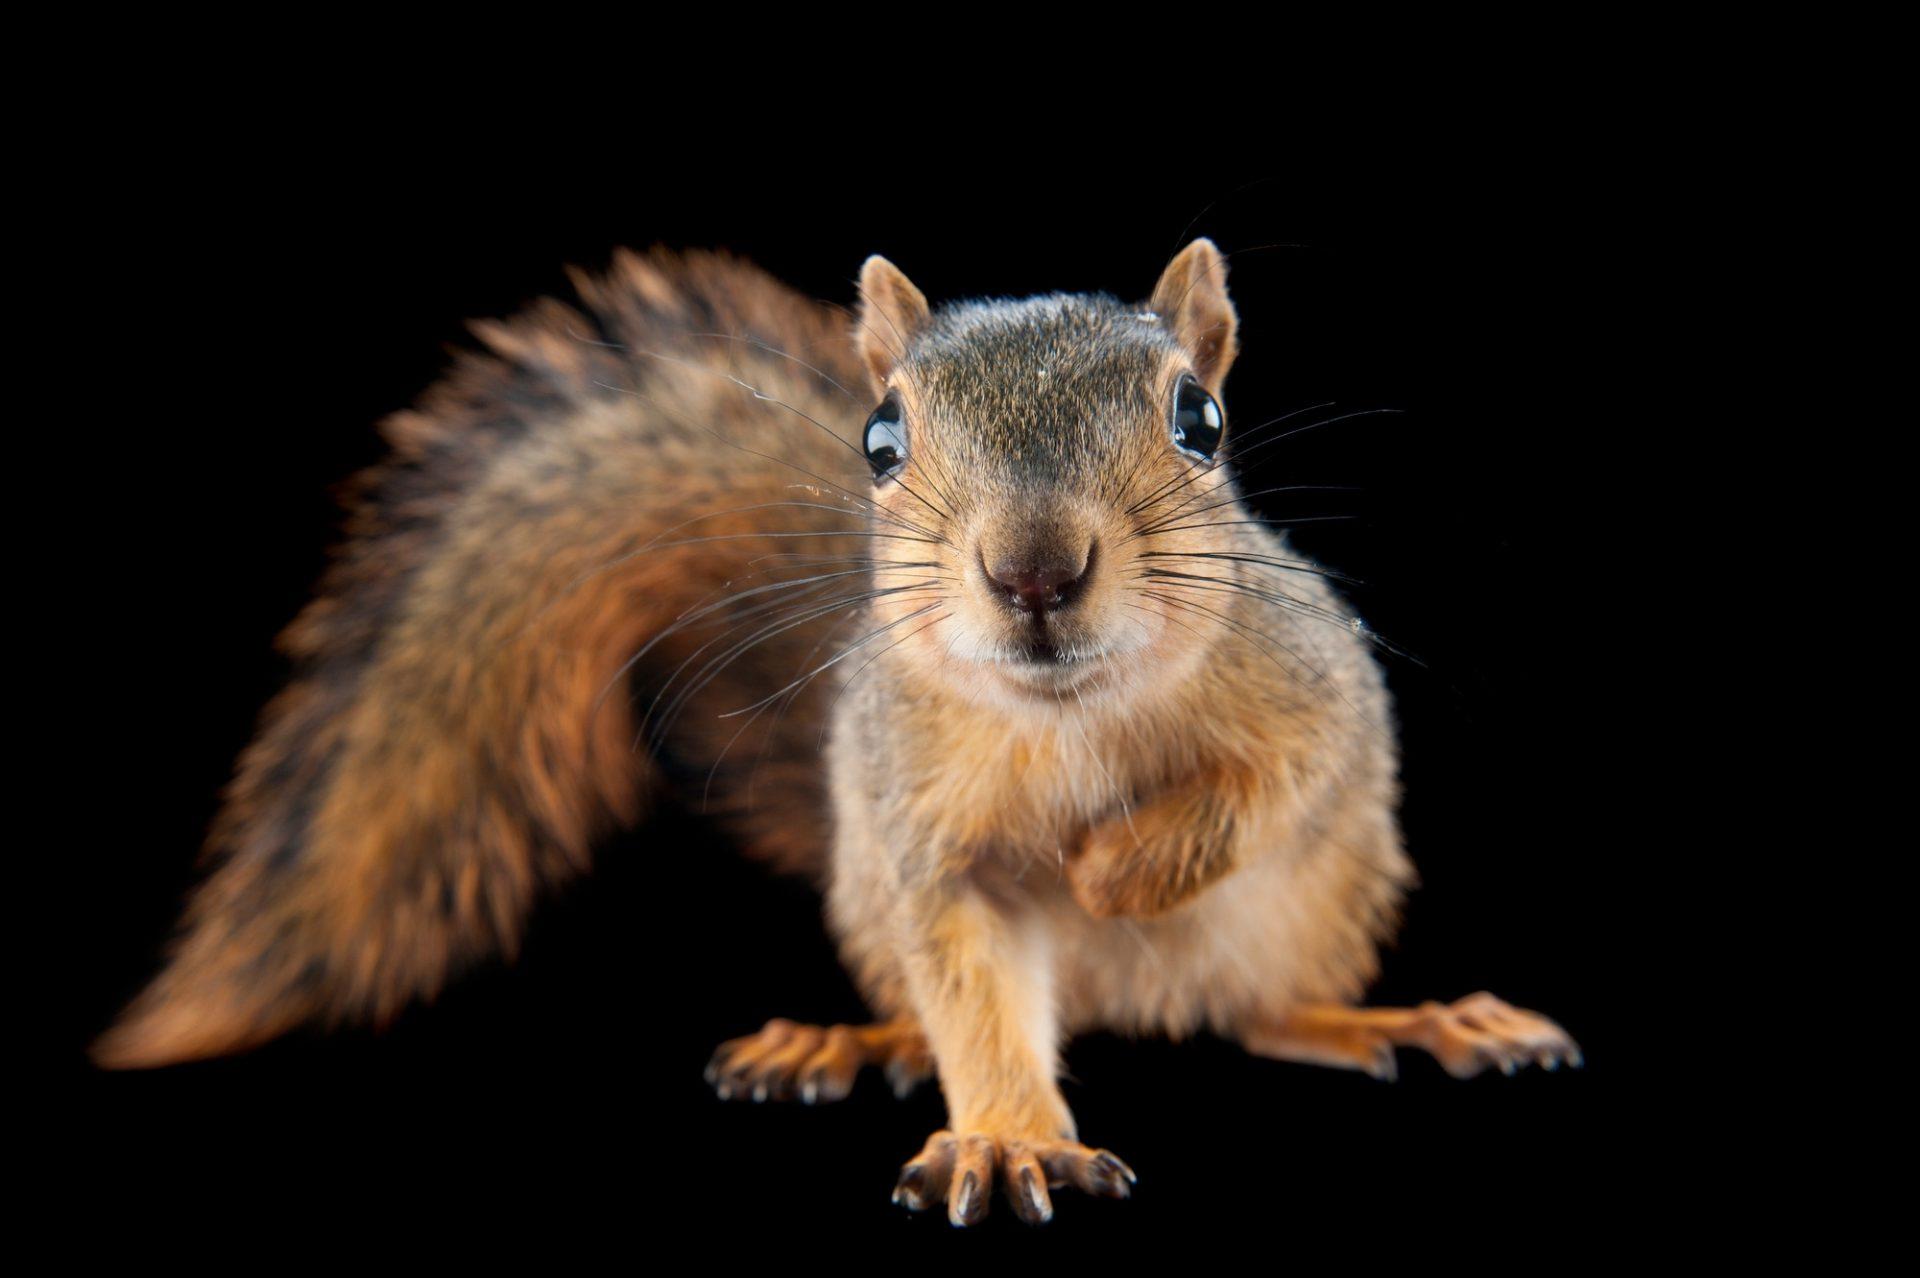 Photo: A fox squirrel, Sciurus niger.